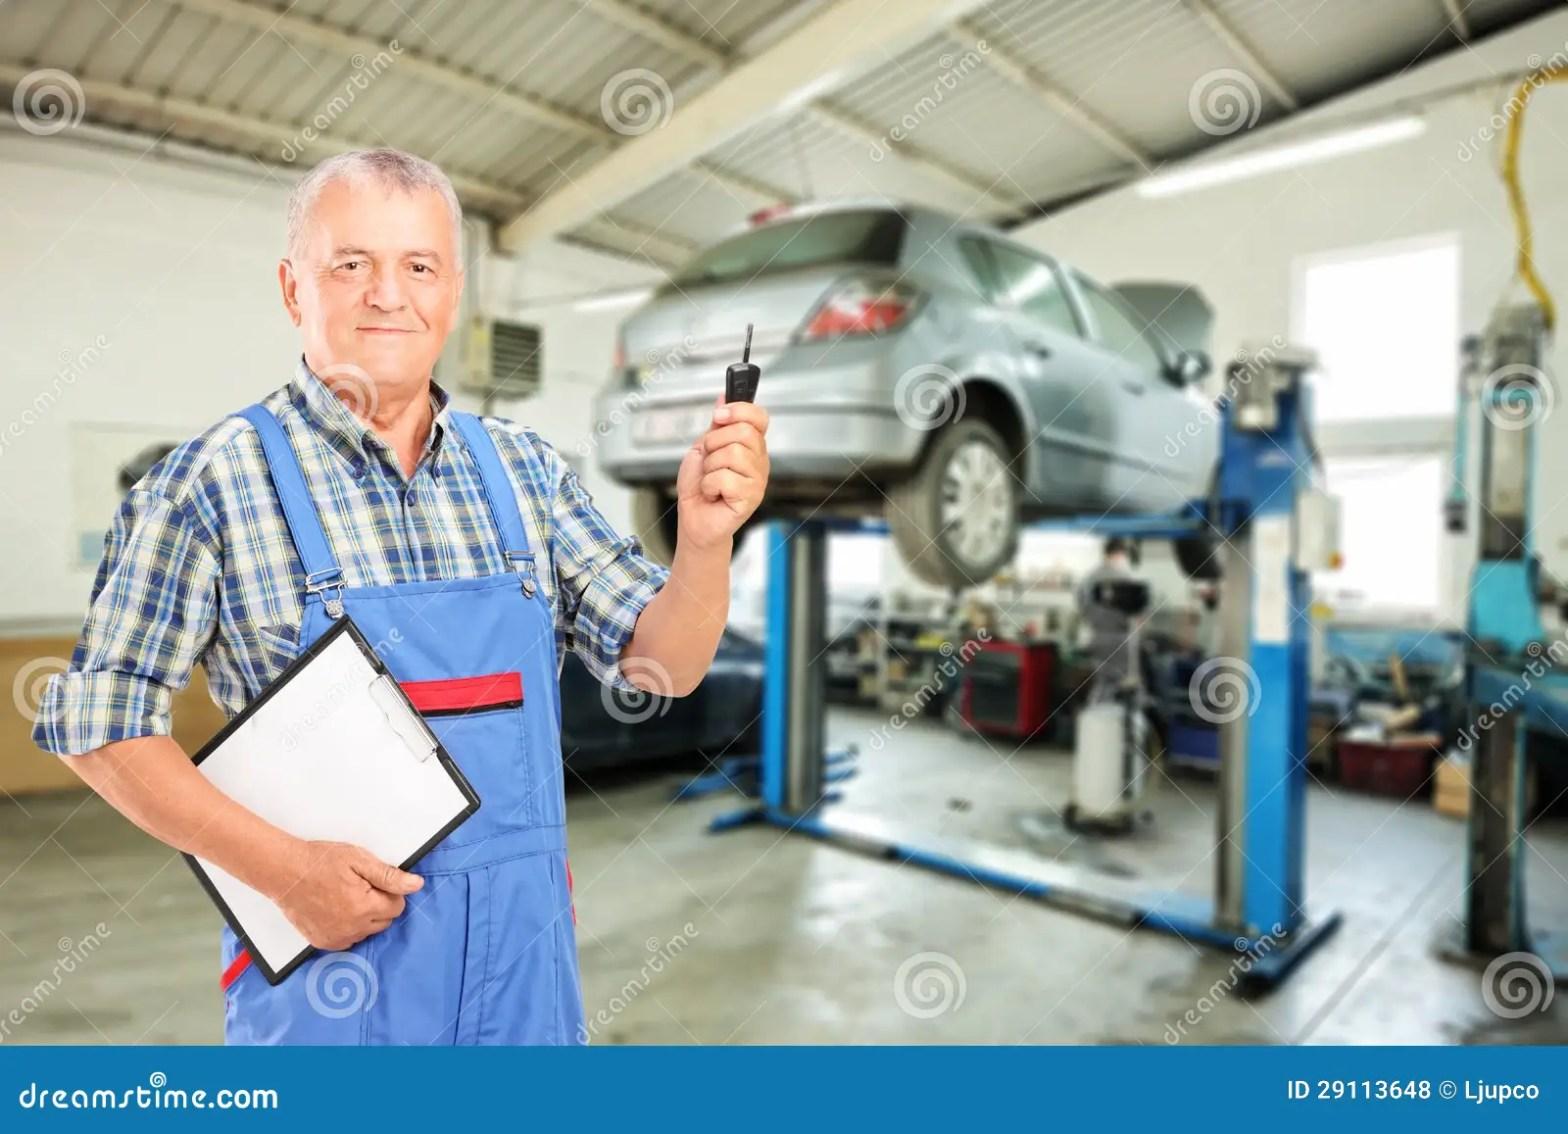 Mechanic Holding A Car Key Atauto Repair Shop Stock Photo